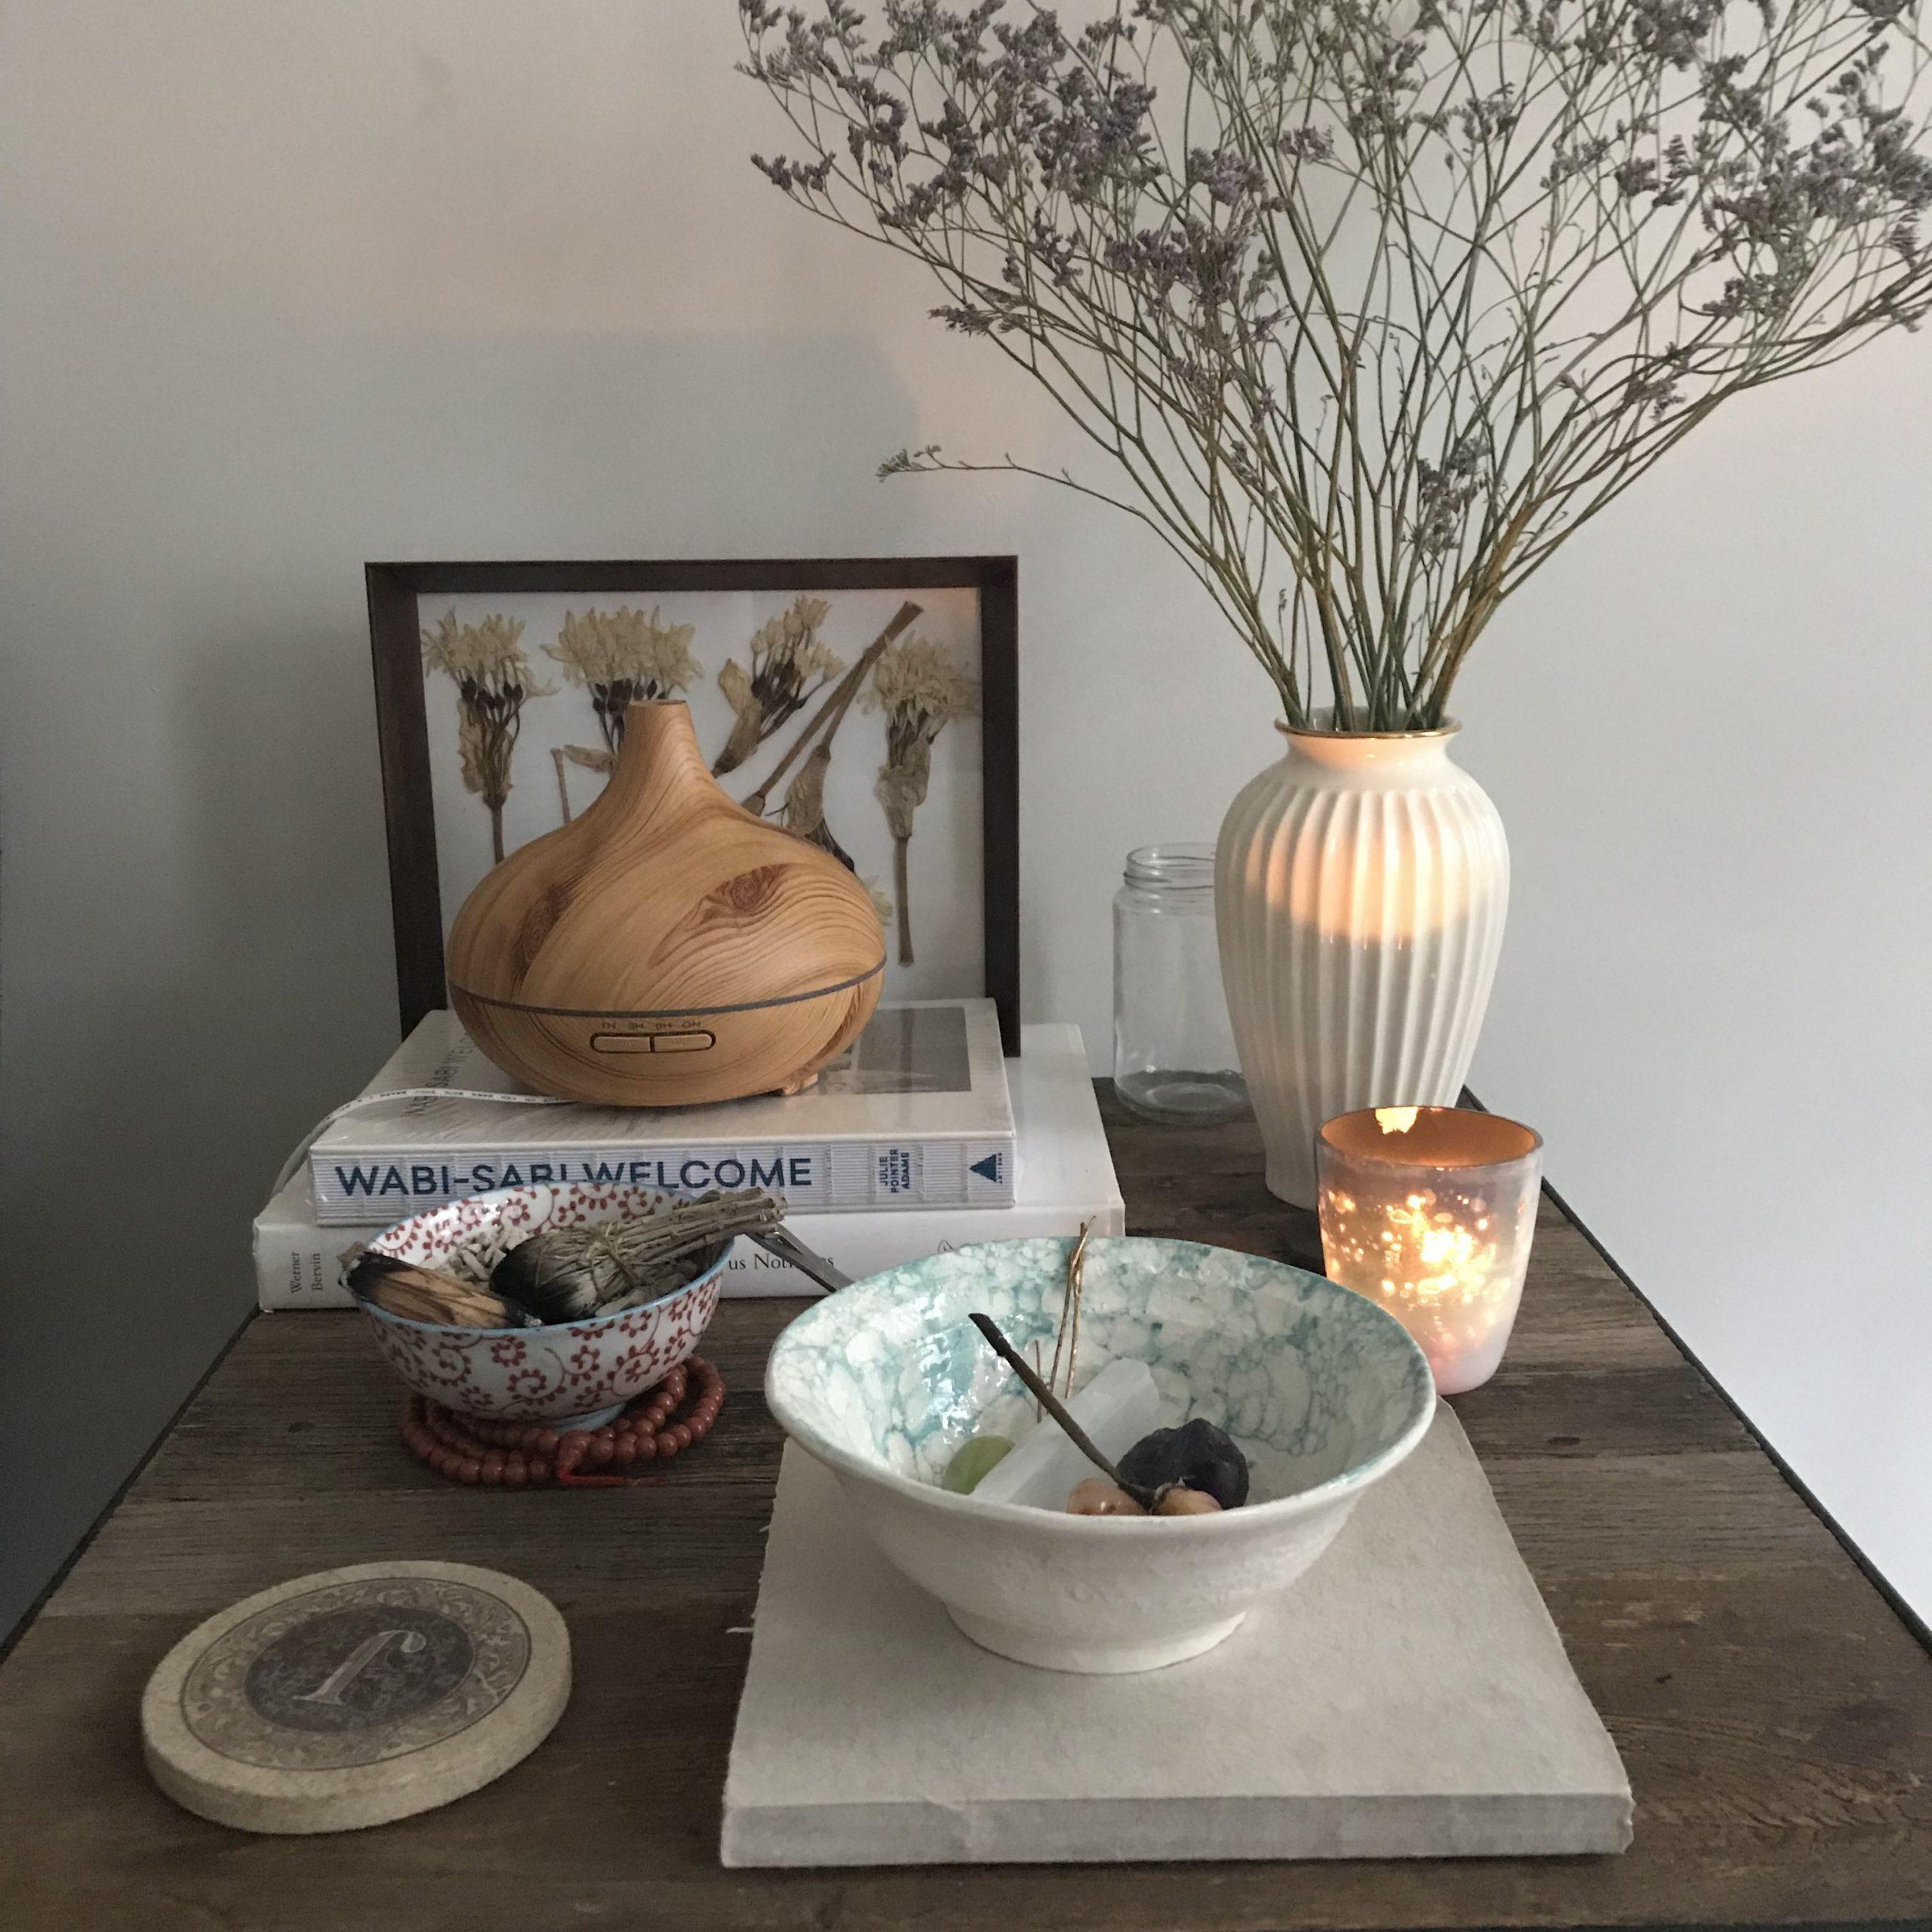 How to Create a Wellness Altar